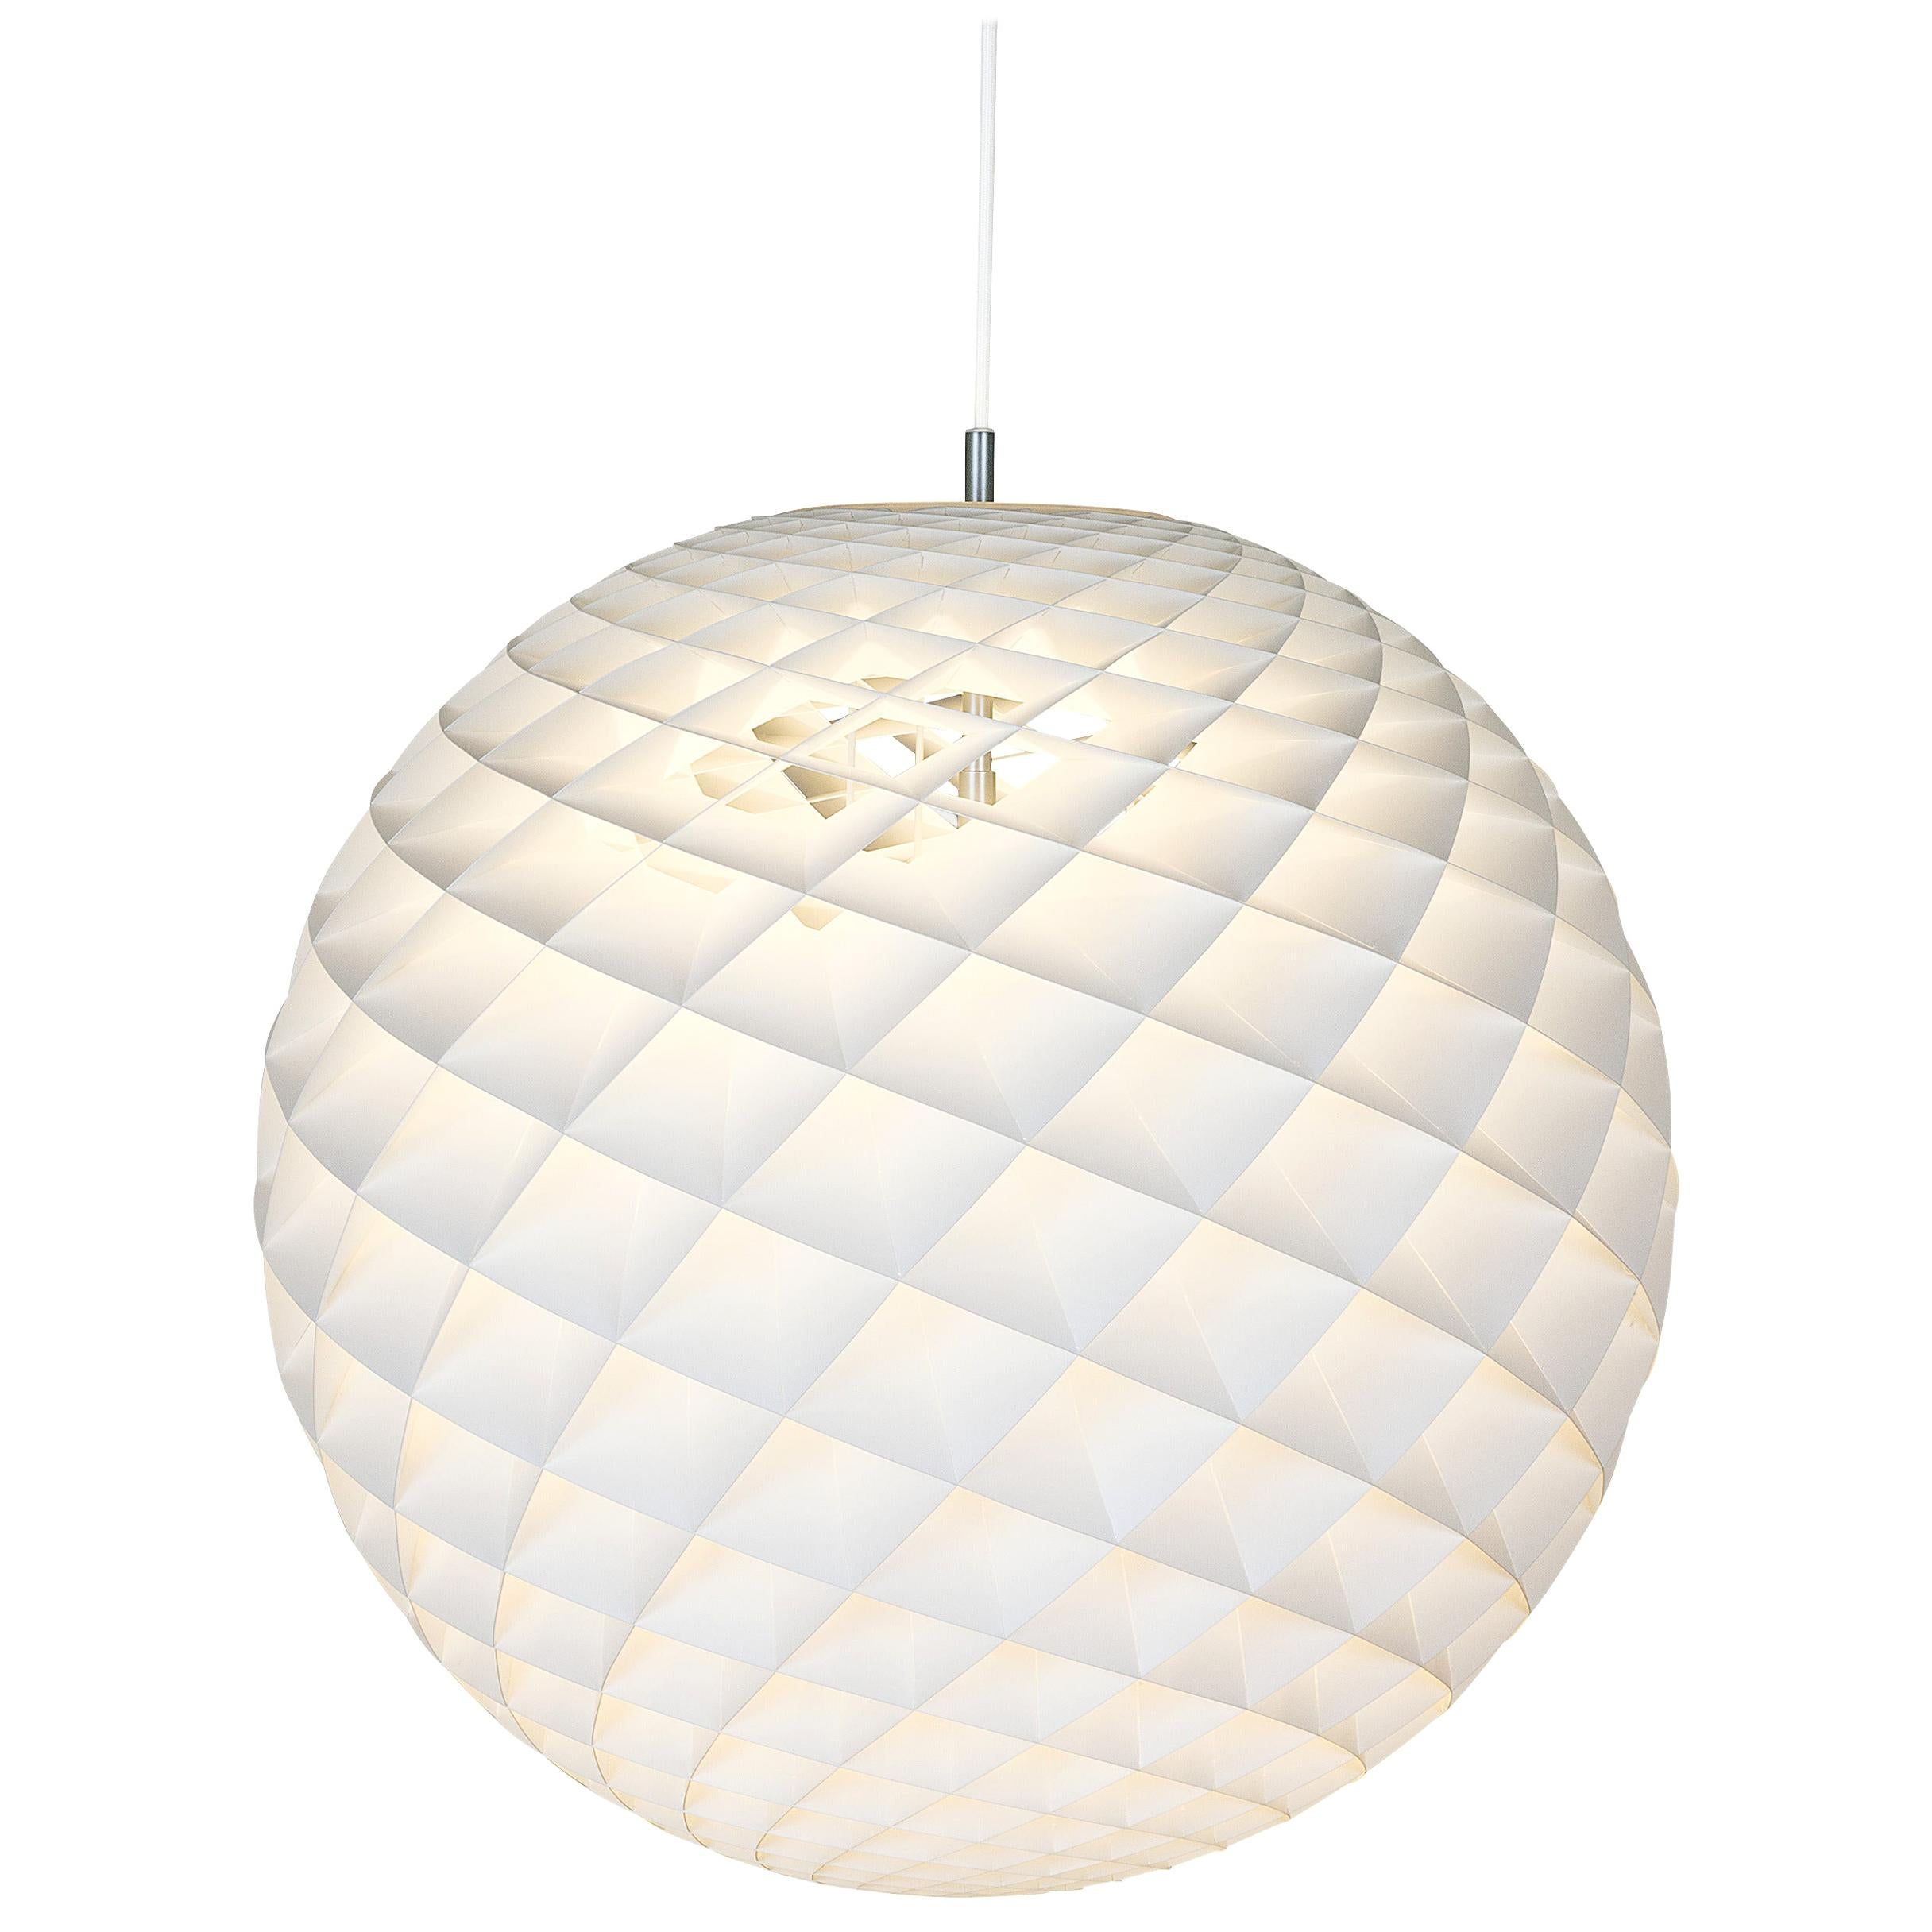 Louis Poulsen Medium Patera Pendant Light by Øivind Slaatto